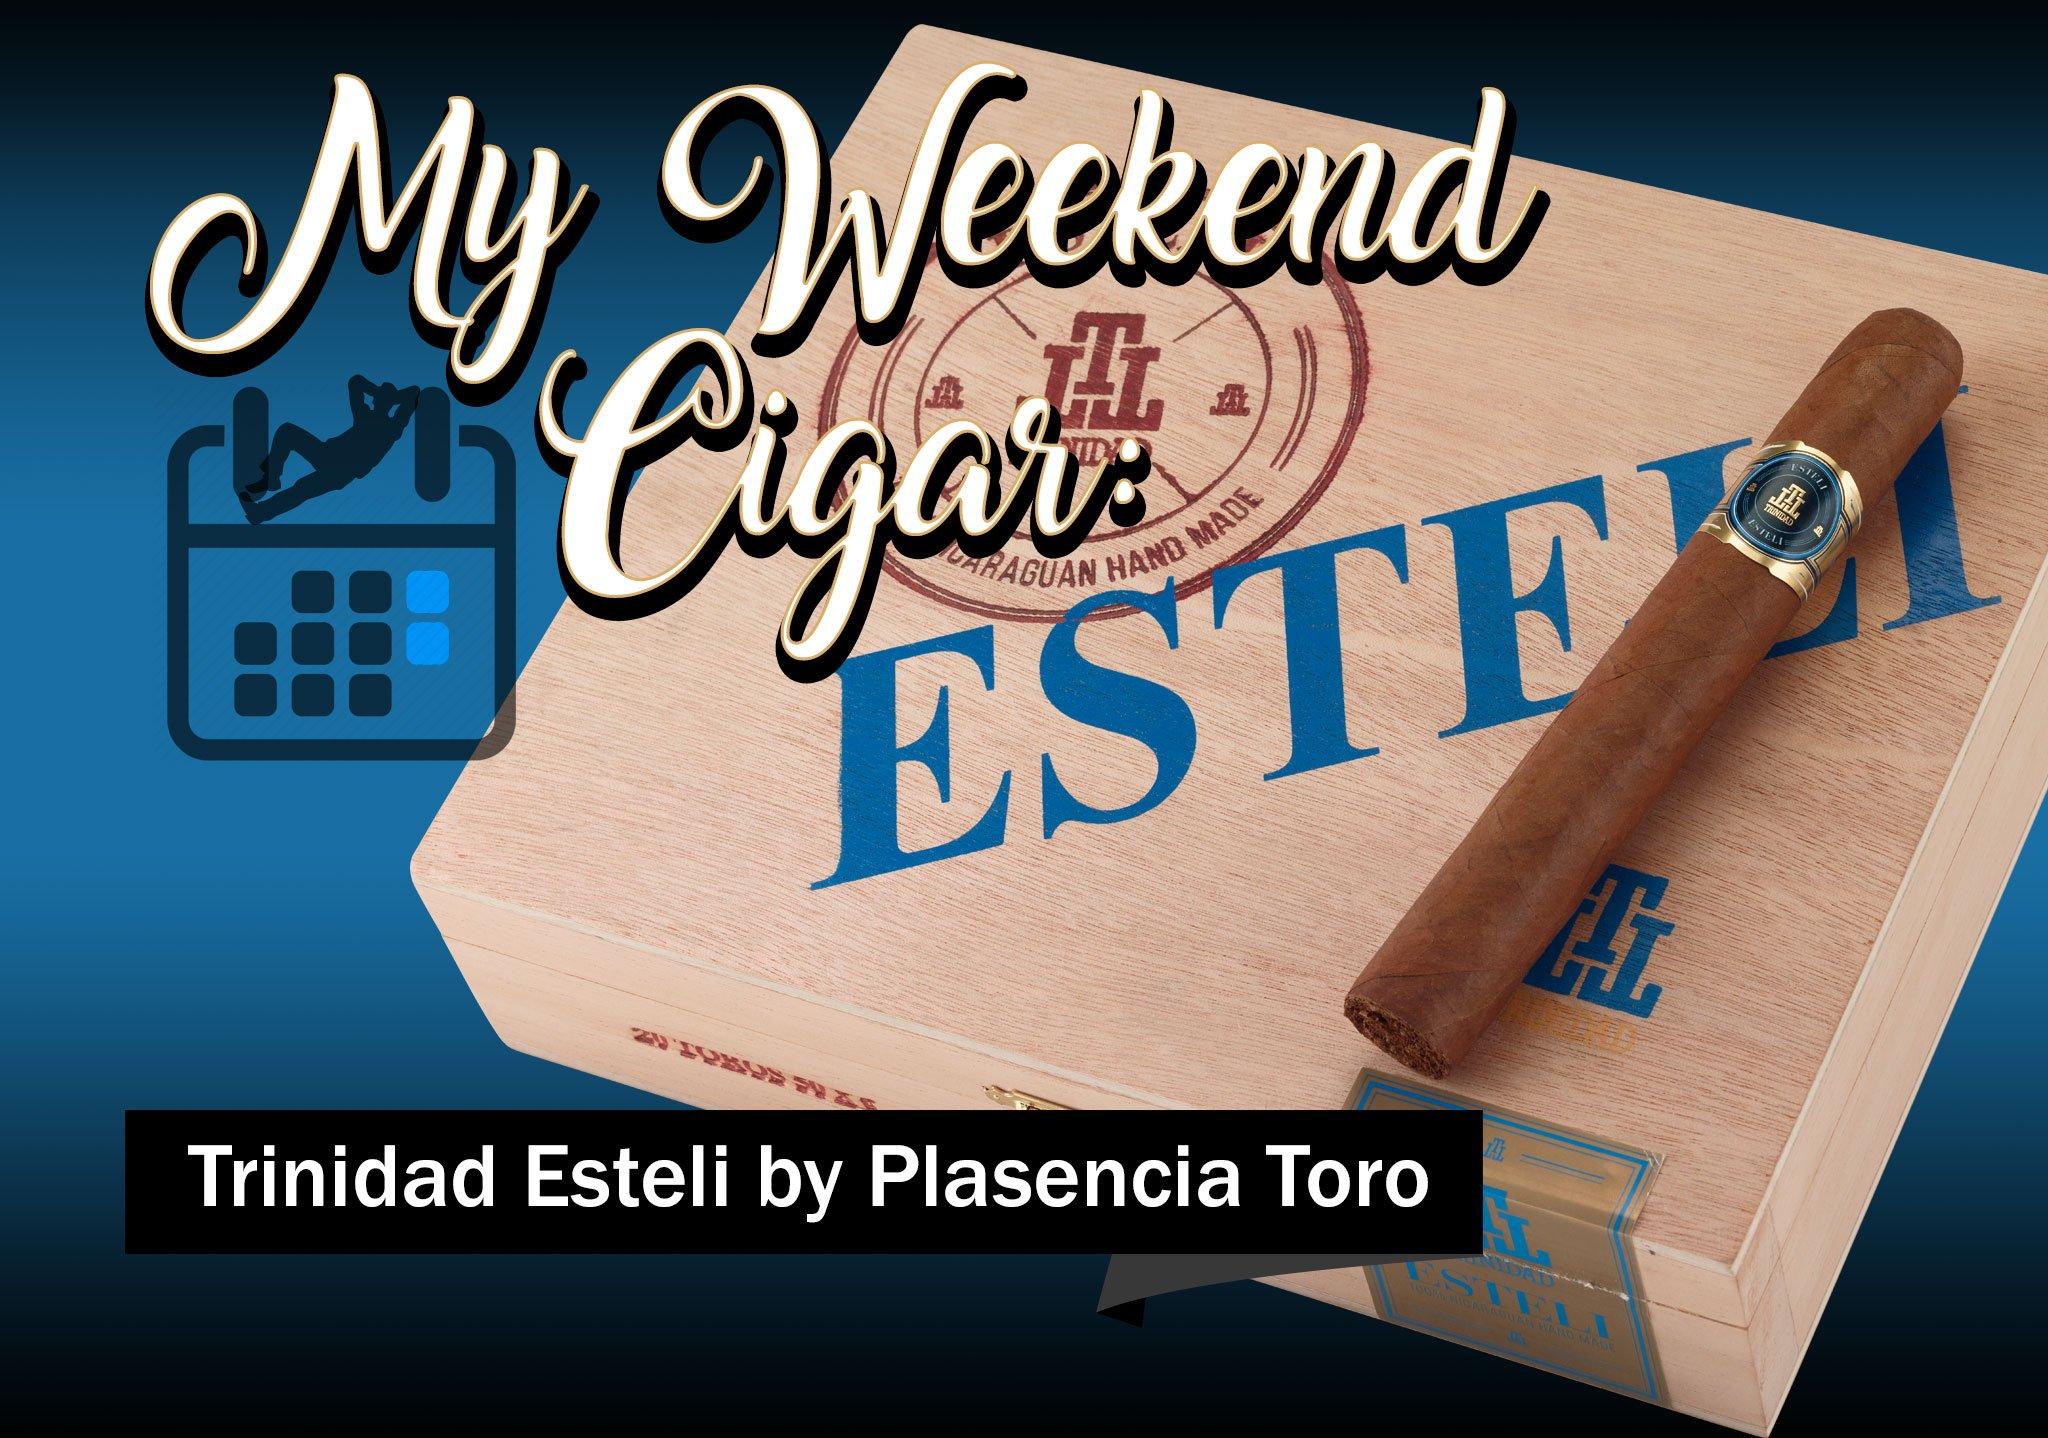 My Weekend Cigar: May 28, 2018 – Trinidad Esteli by Plasencia Toro